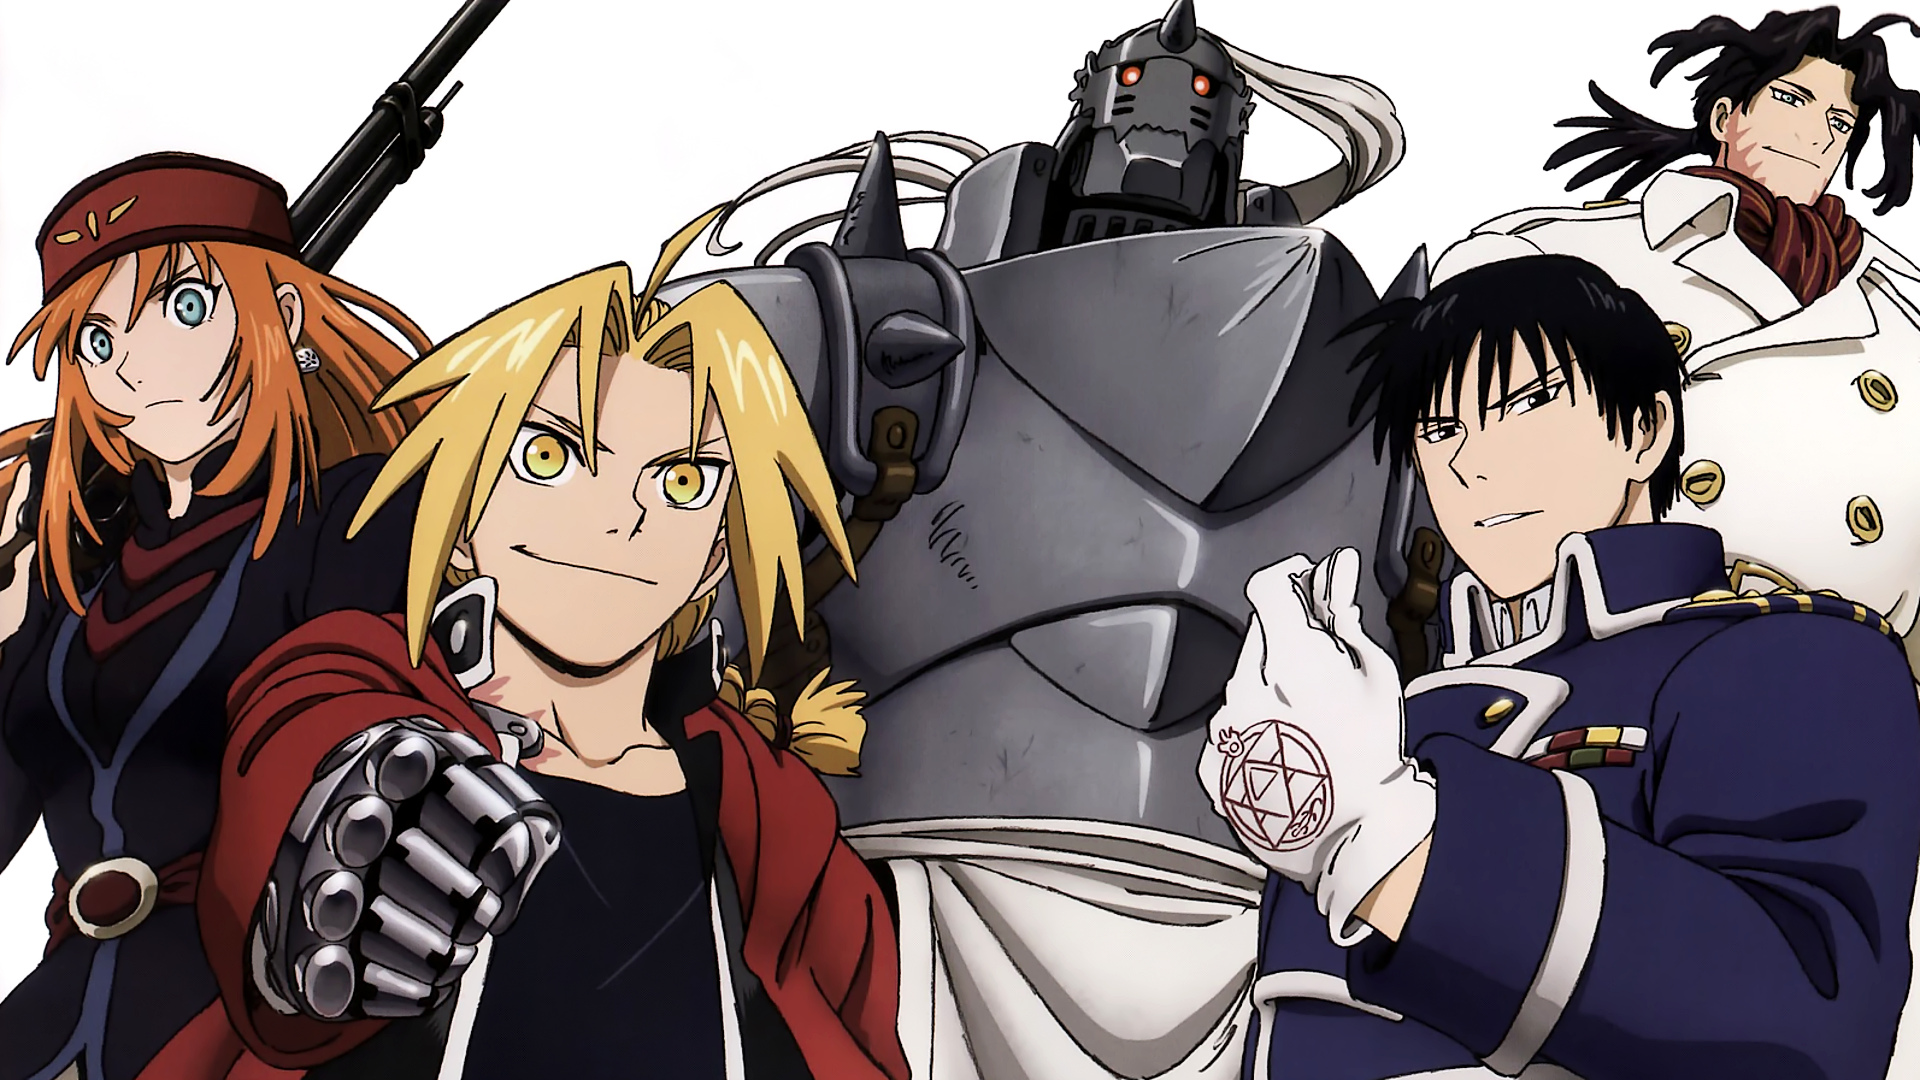 Movie Fanart: Fullmetal Alchemist: The Sacred Star Of Milos